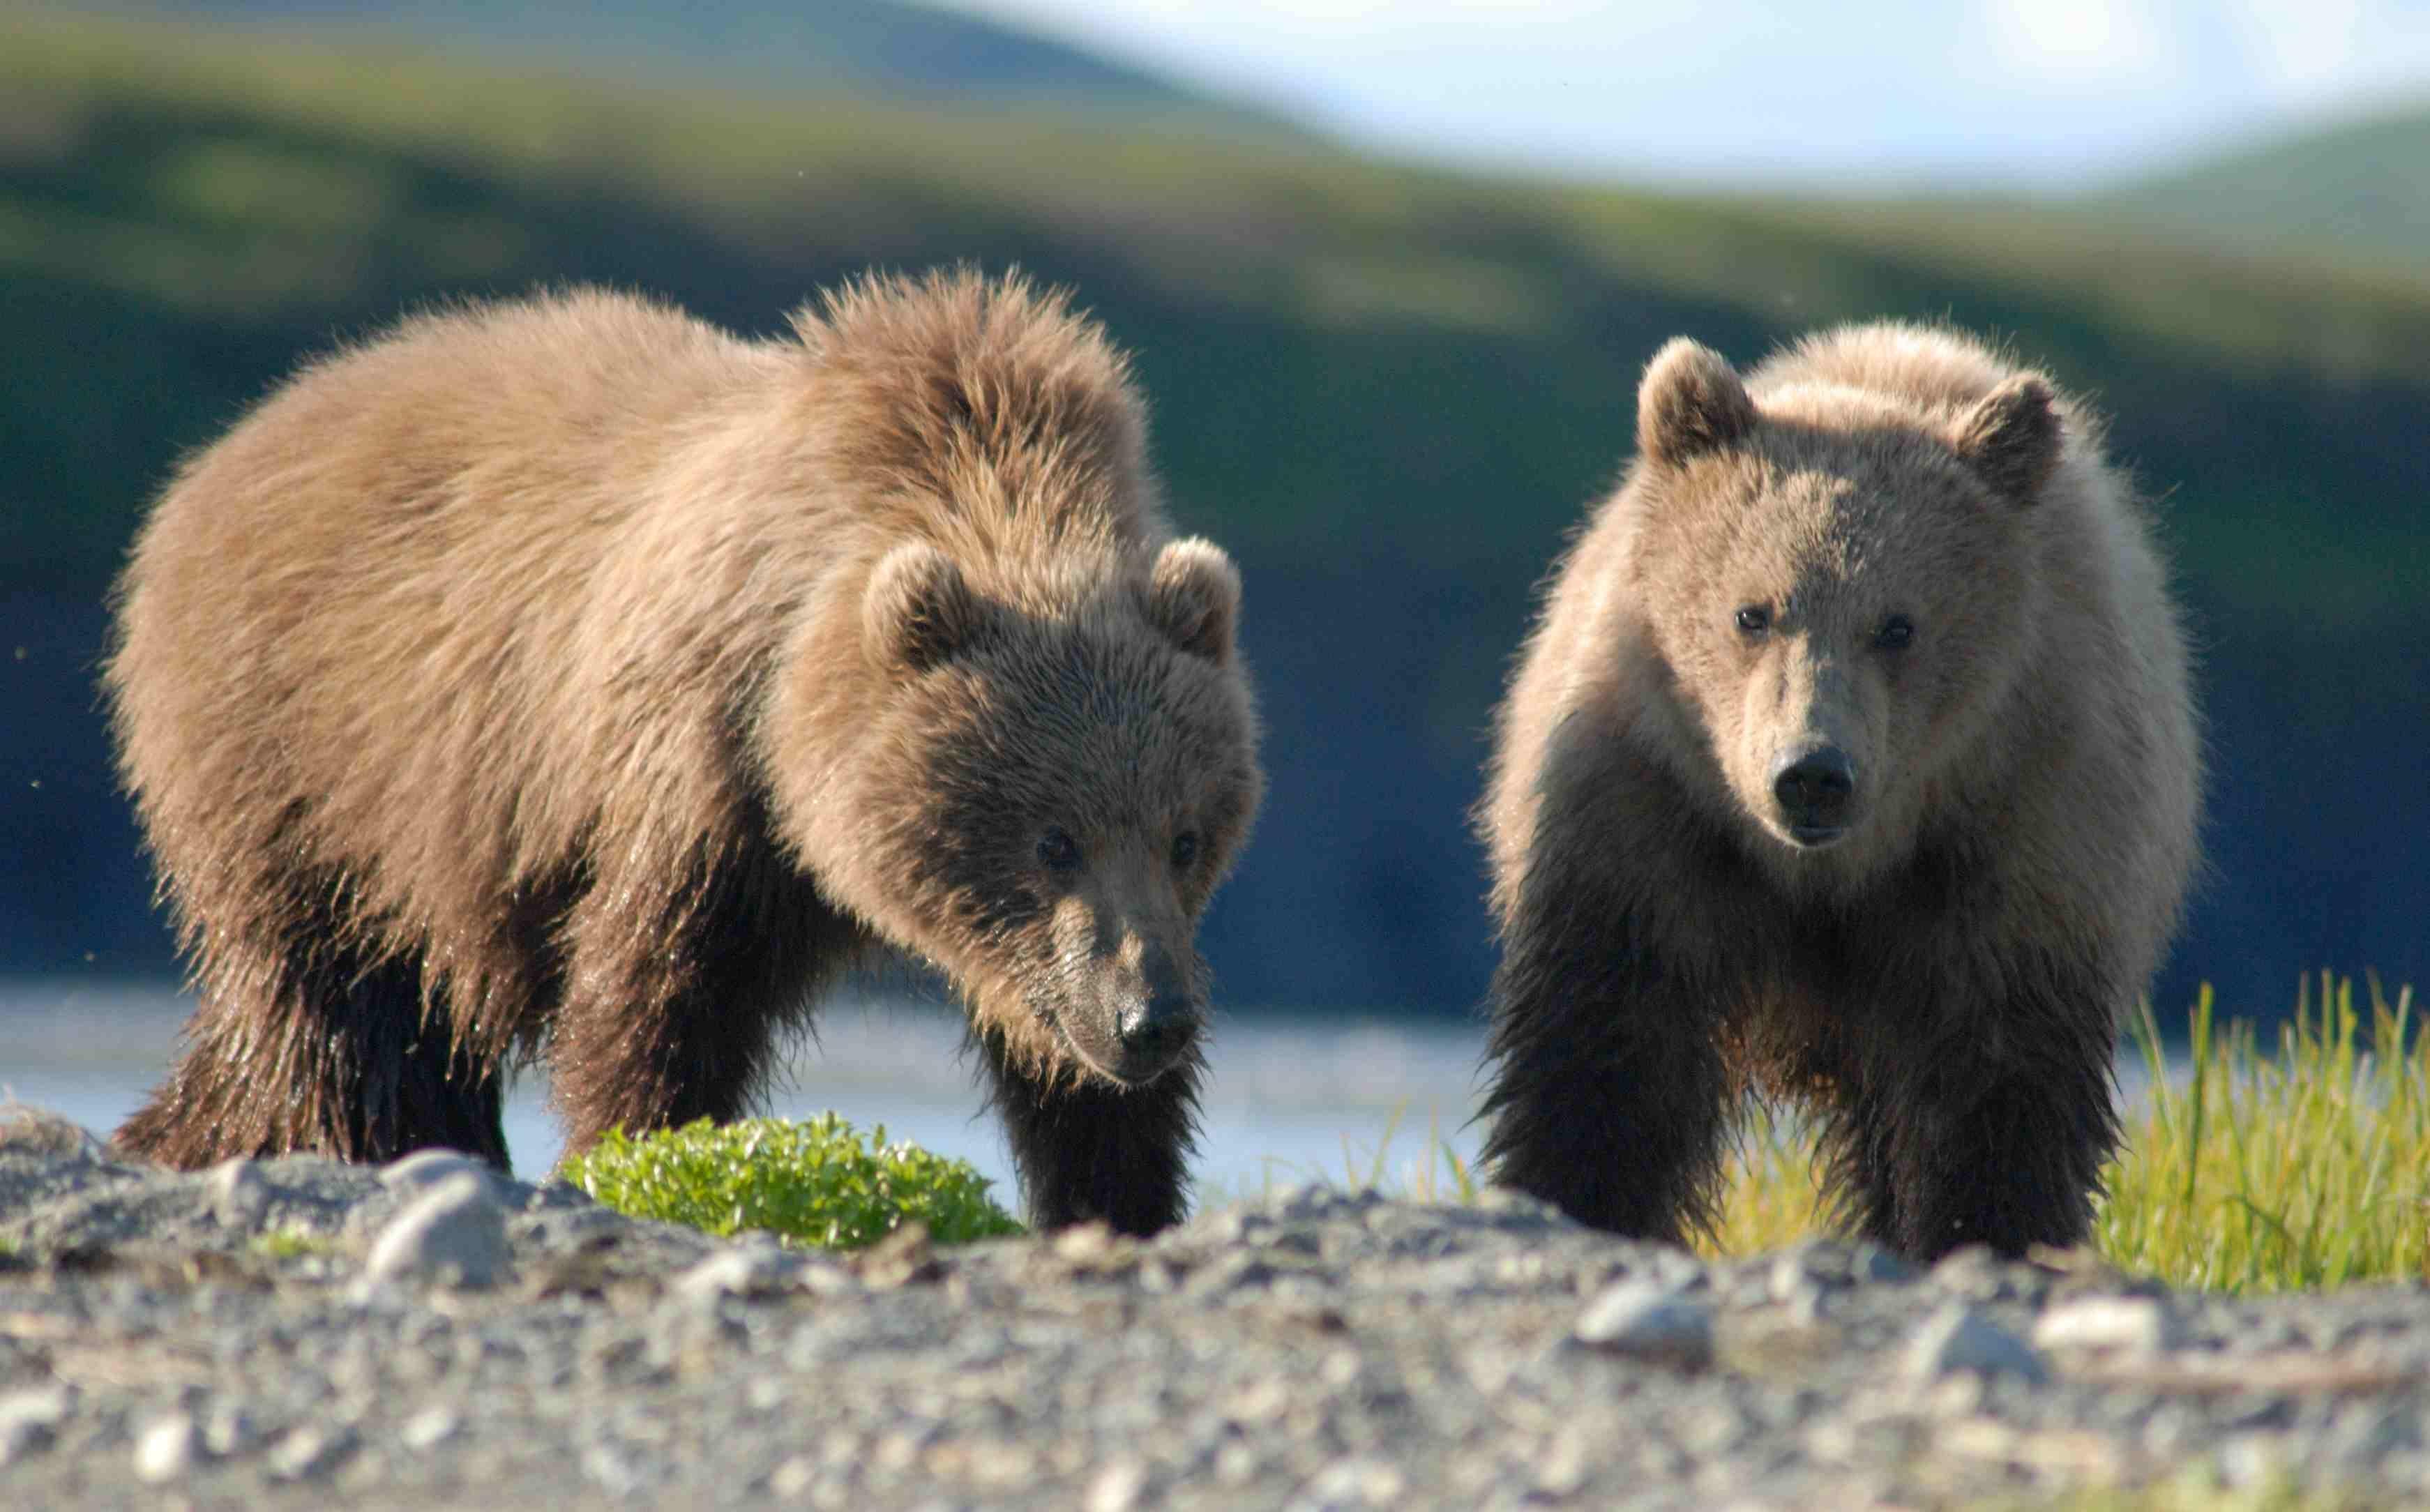 CORRECTED-Fat is fabulous for bears in Alaska's Katmai National Park